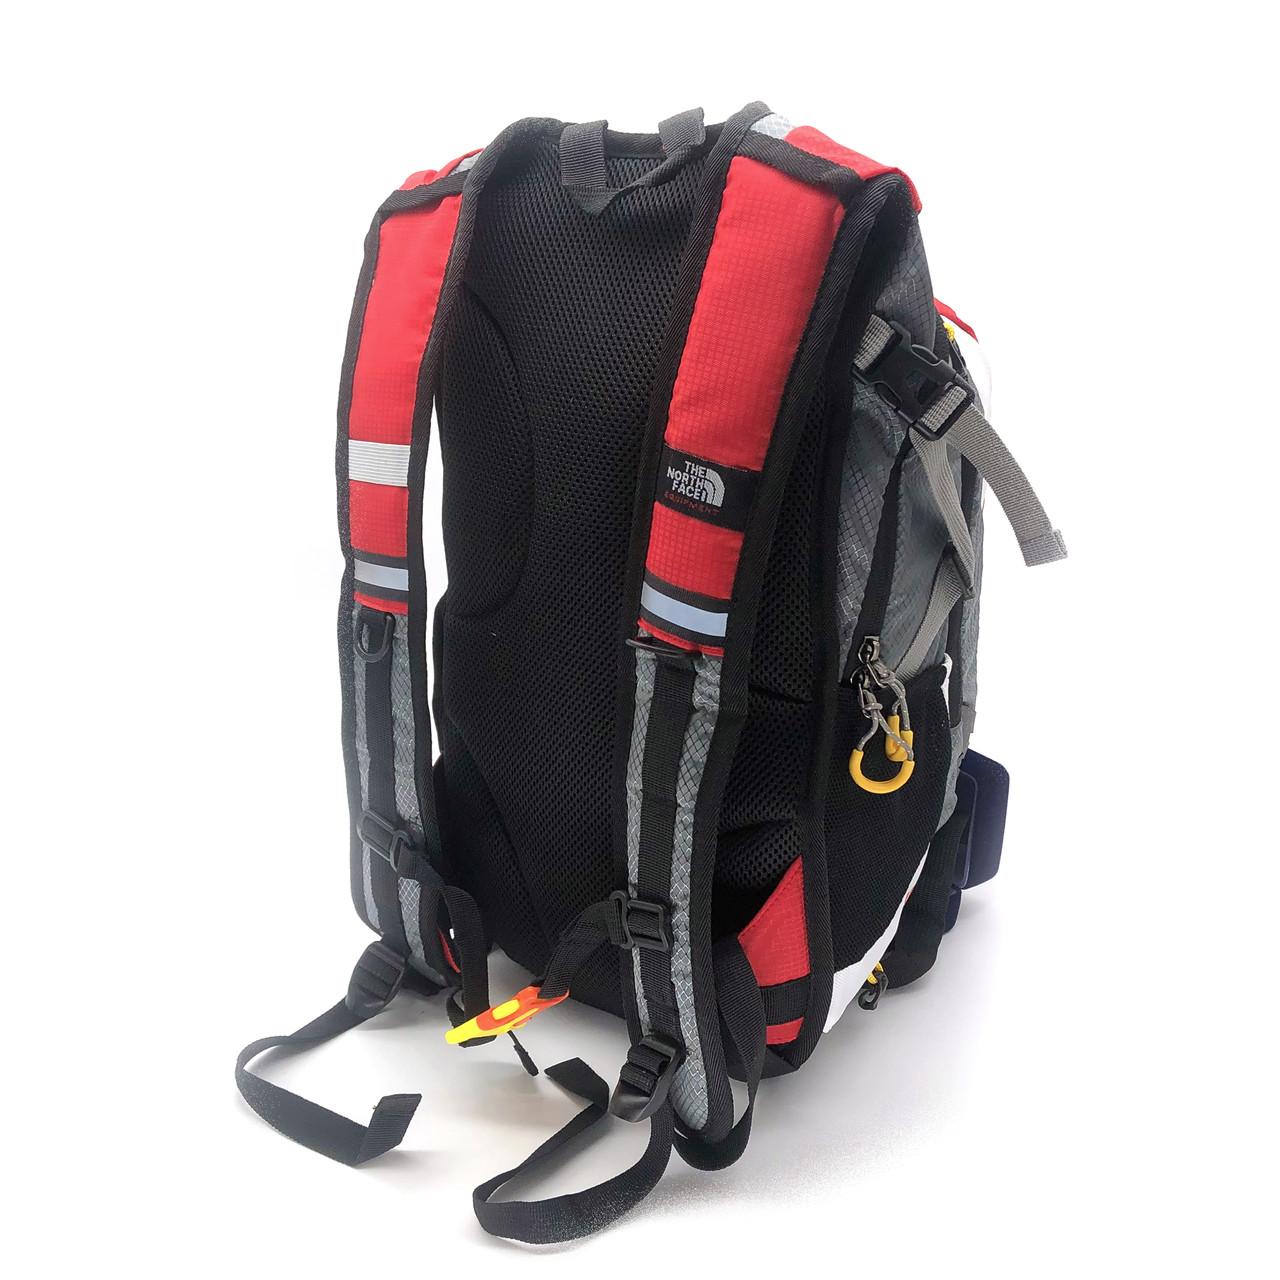 Спортивный рюкзак для бега - фото 4